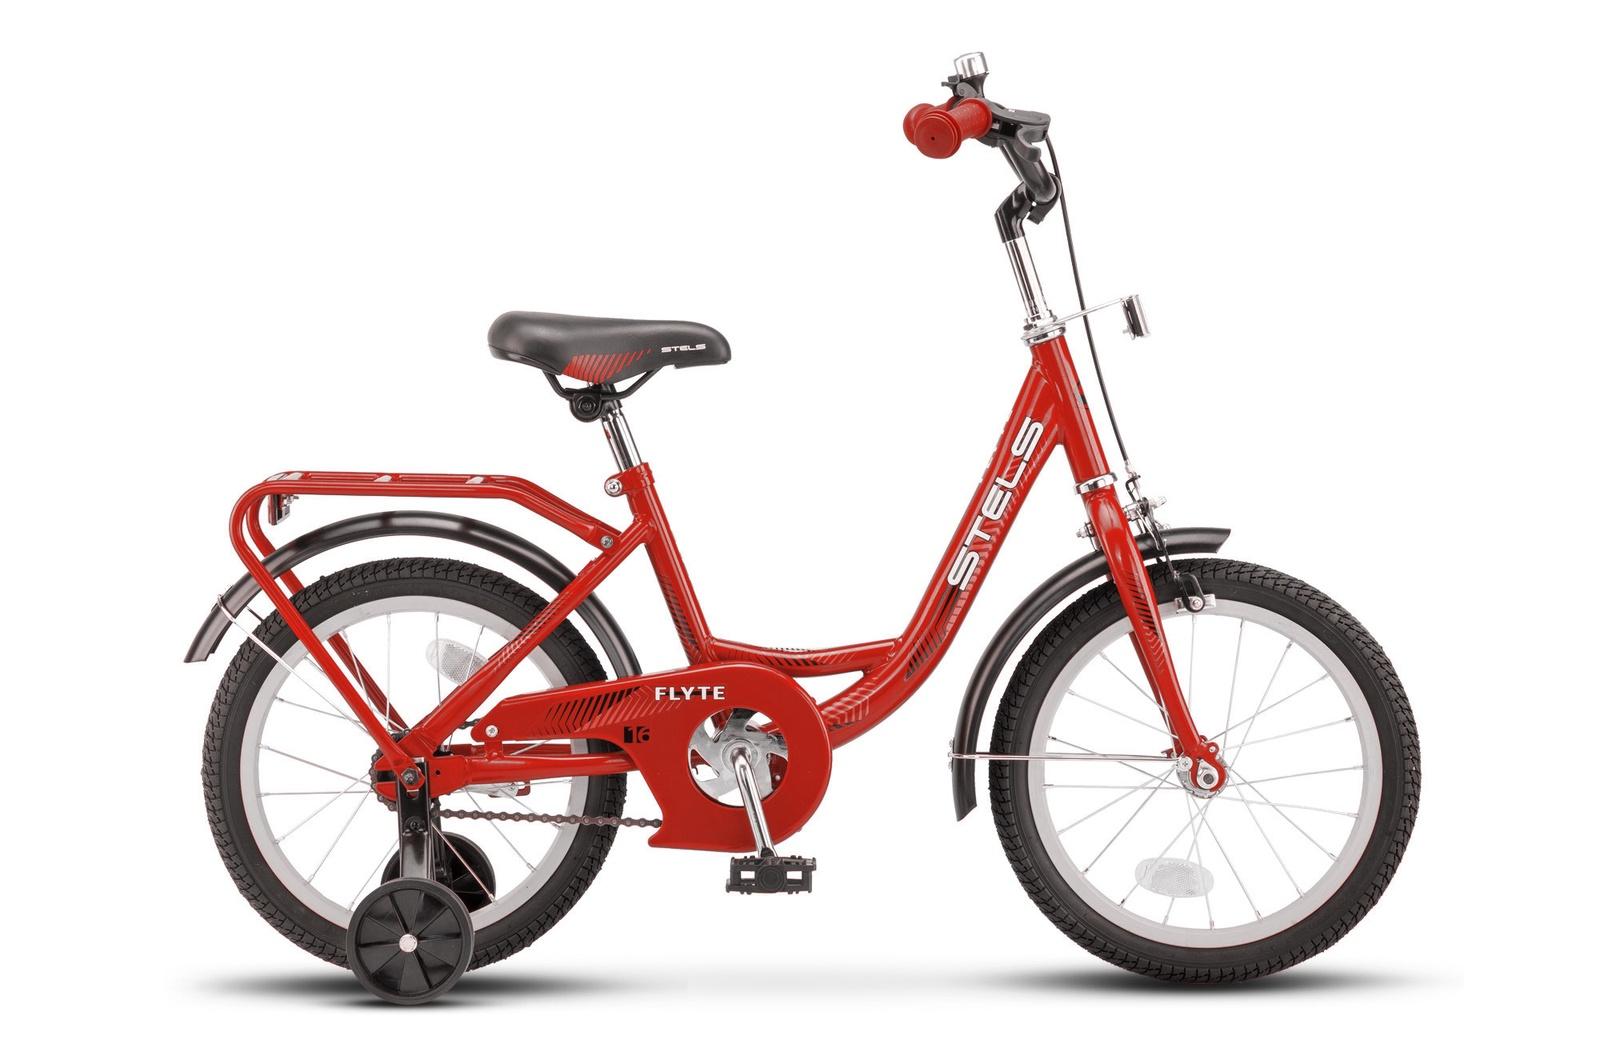 Велосипед STELS Flyte 16 (Z011), красный